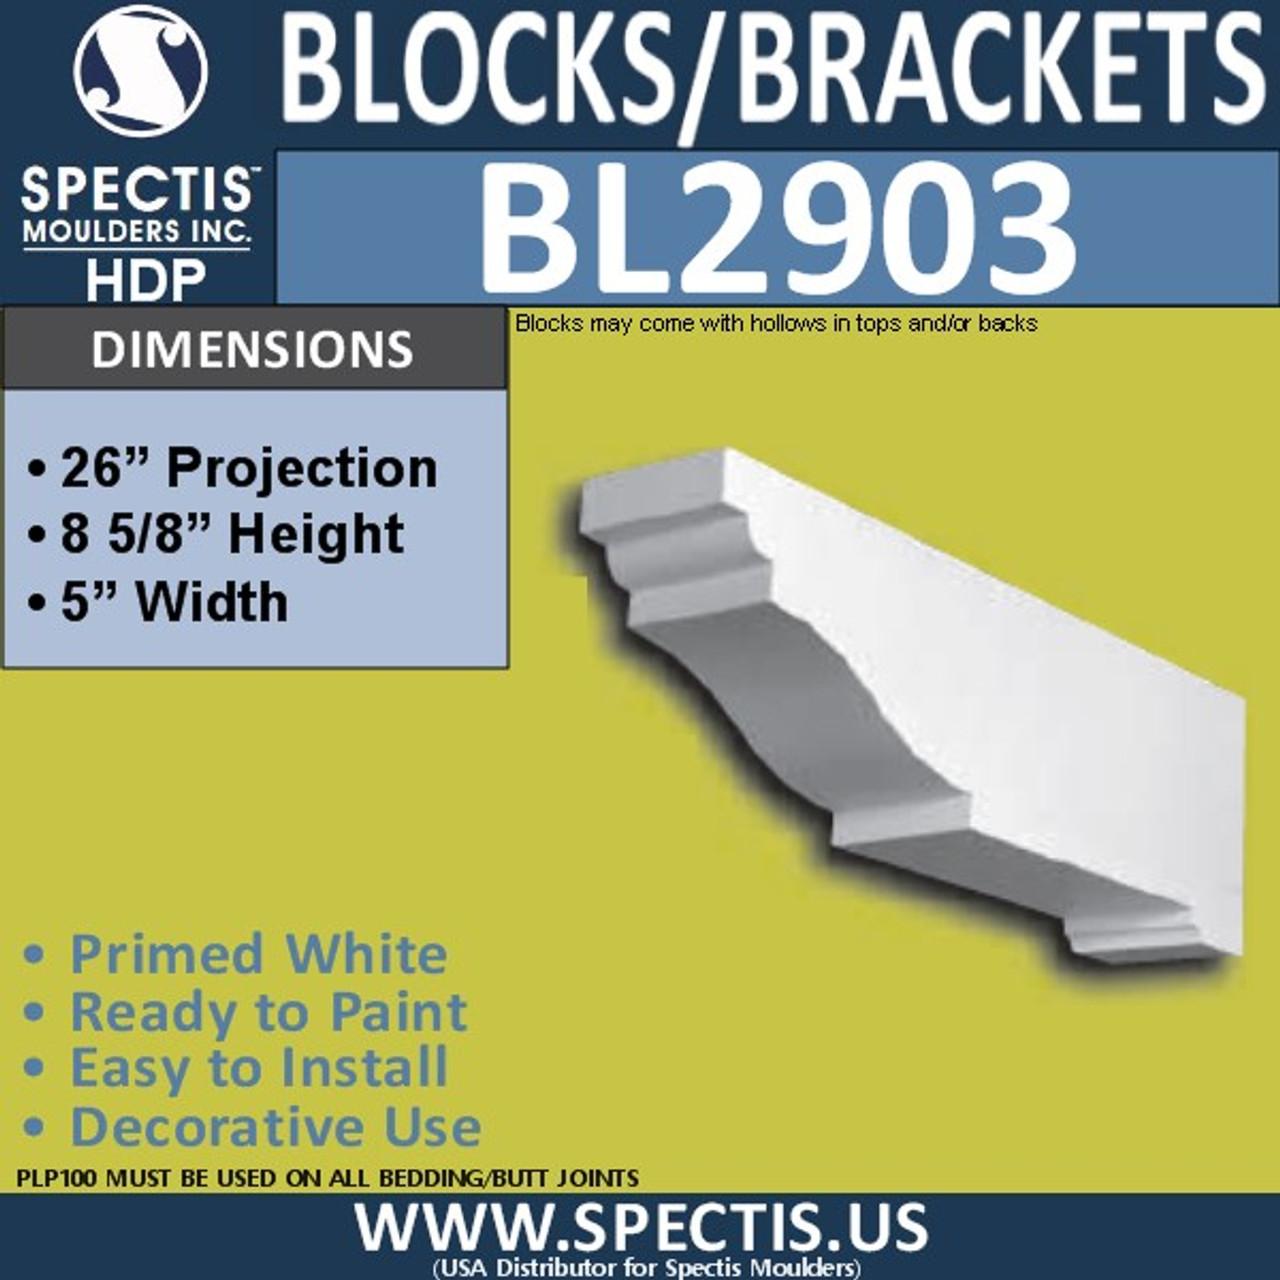 "BL2903 Eave Block or Bracket 5""W x 8.6""H x 26"" P"